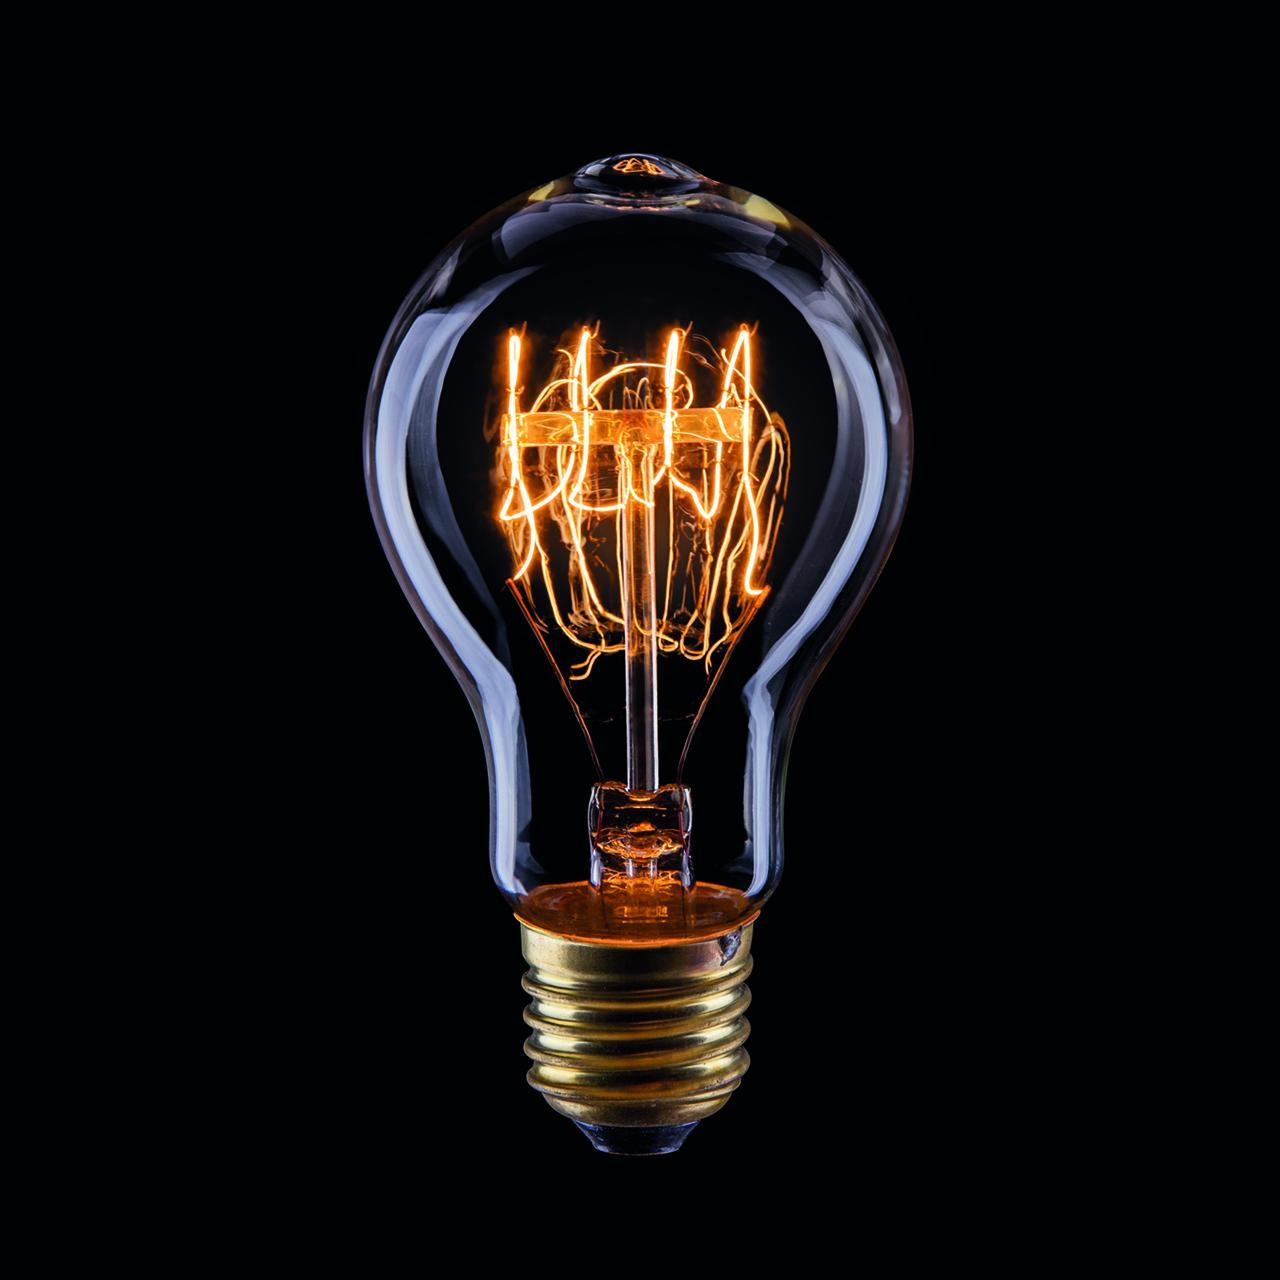 Лампа накаливания E27 60W прозрачная VG6-A19A3-60W 5929 free shipping 5pcs lot 2sj6920 j6920 20a 1700v 60w to3pl